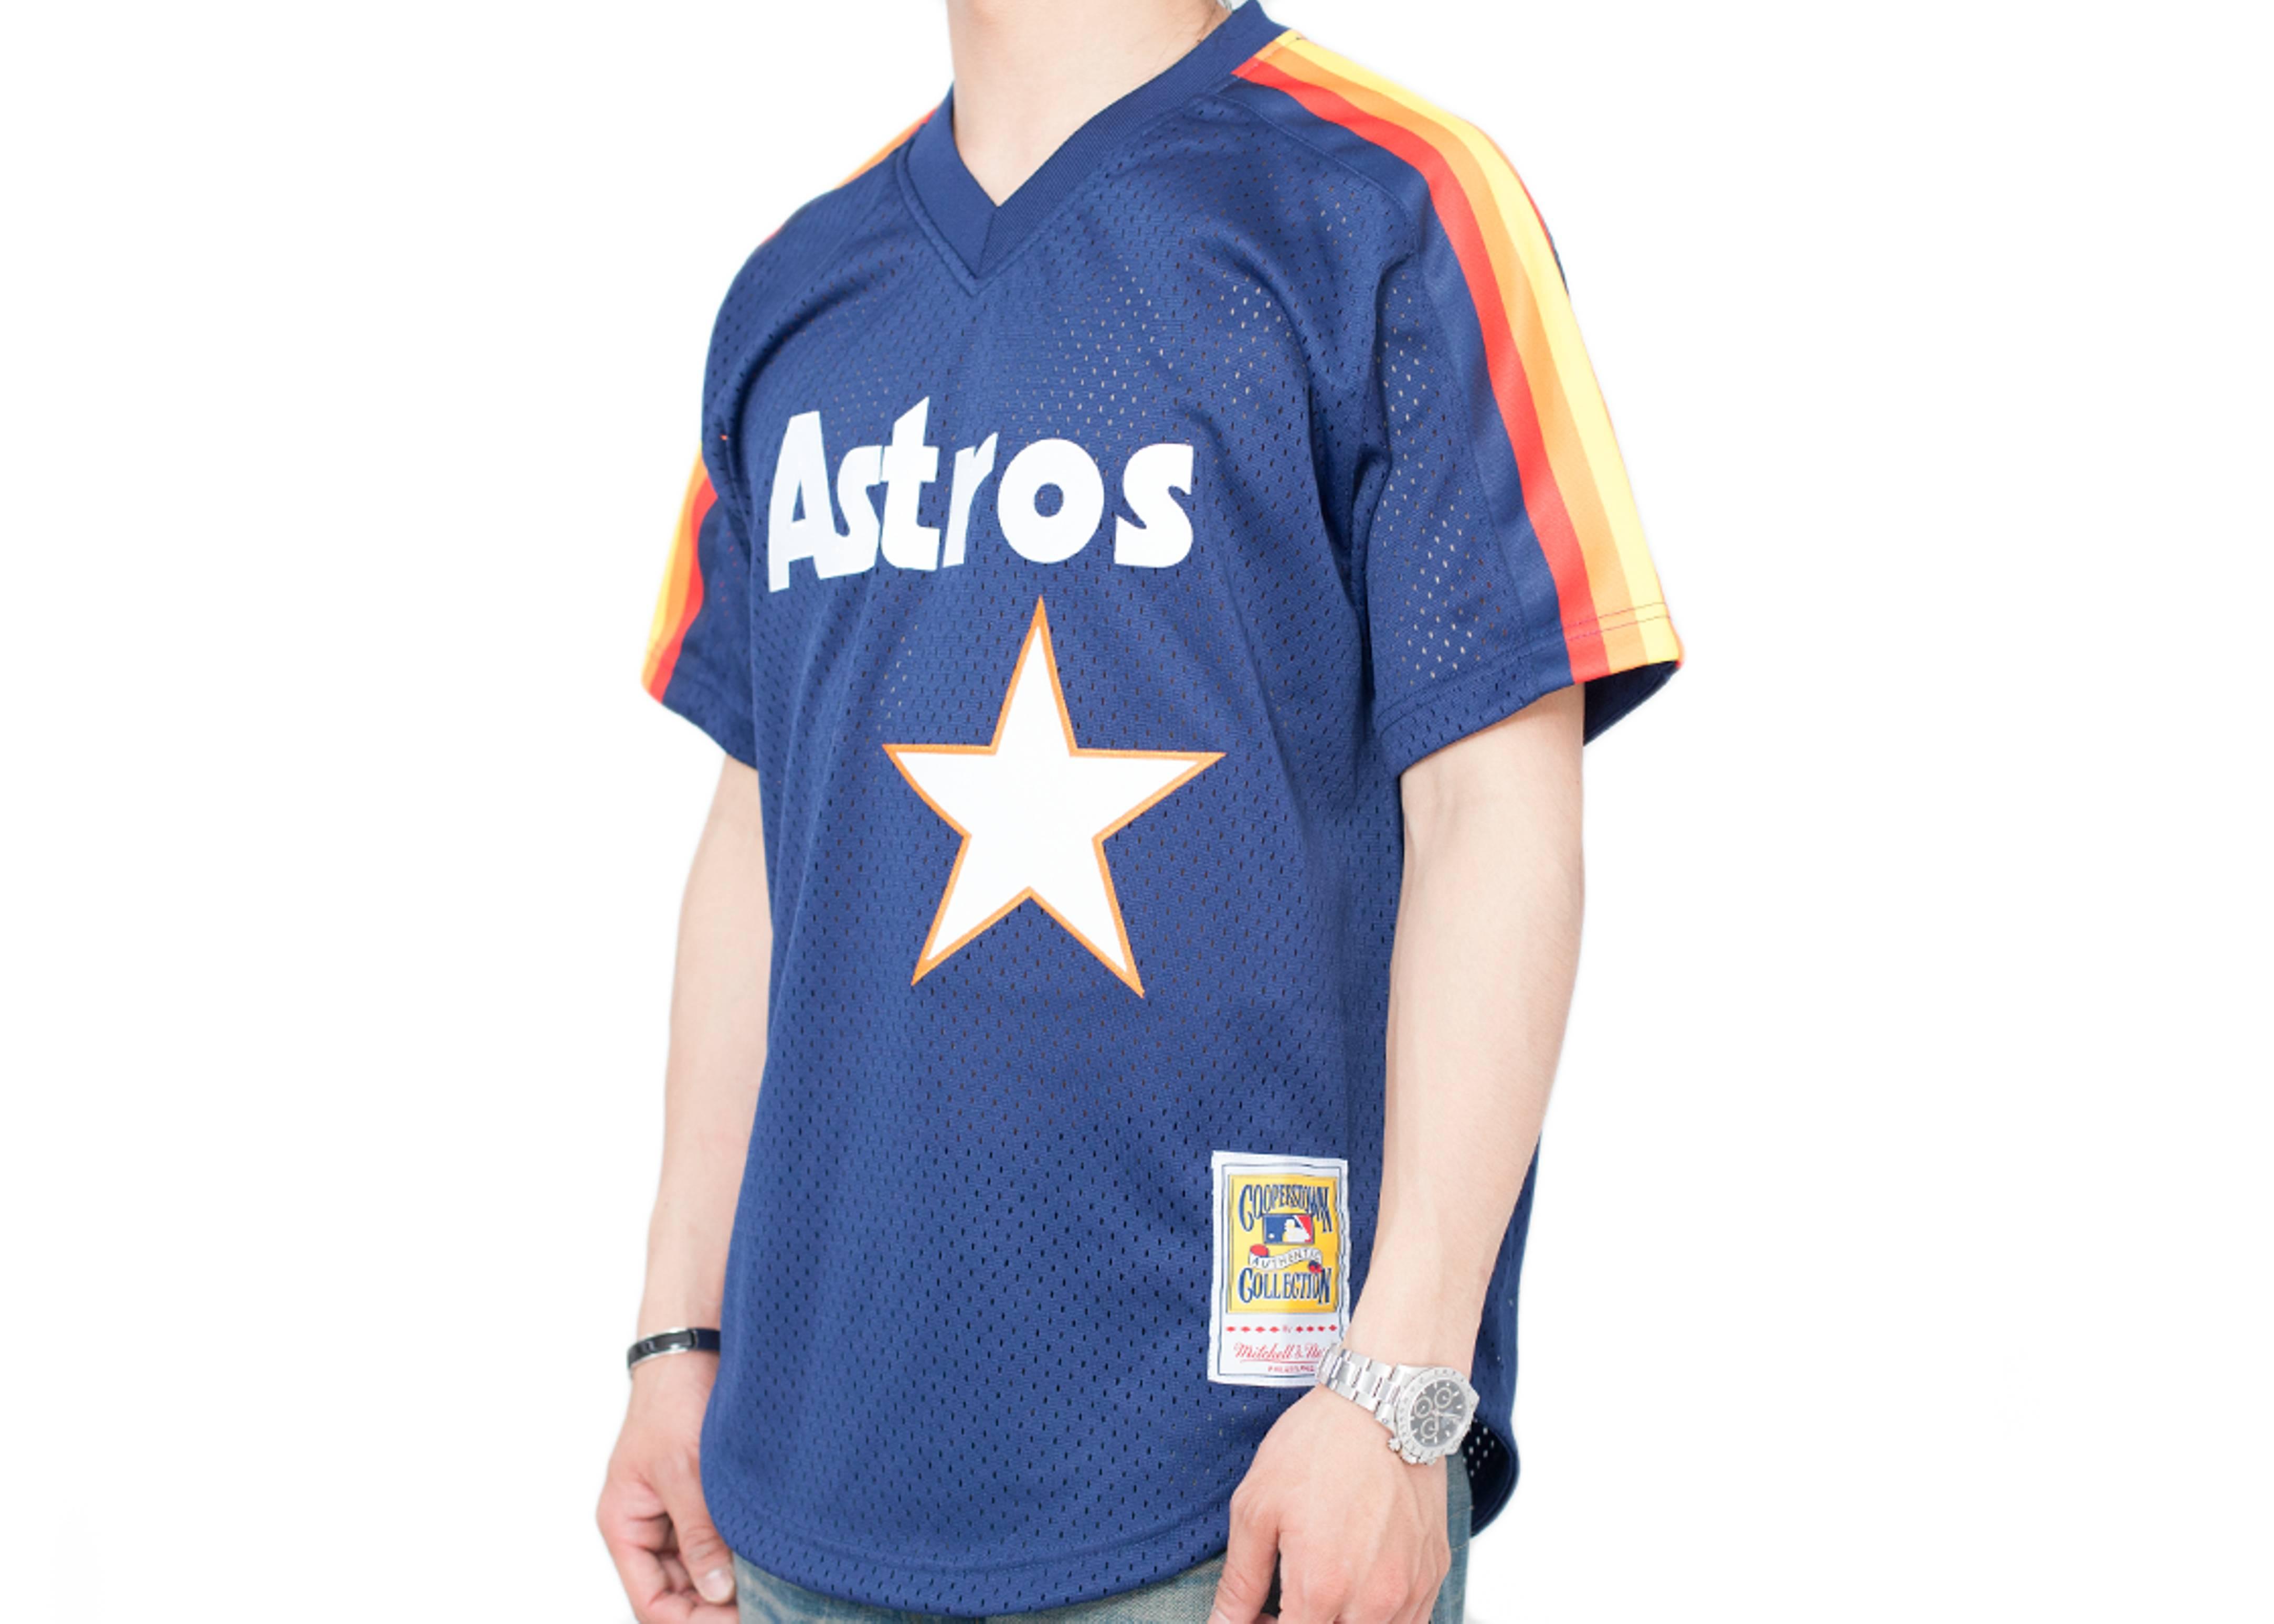 805faff1e6d Houston Astros Authentic Mesh Bp Jersey